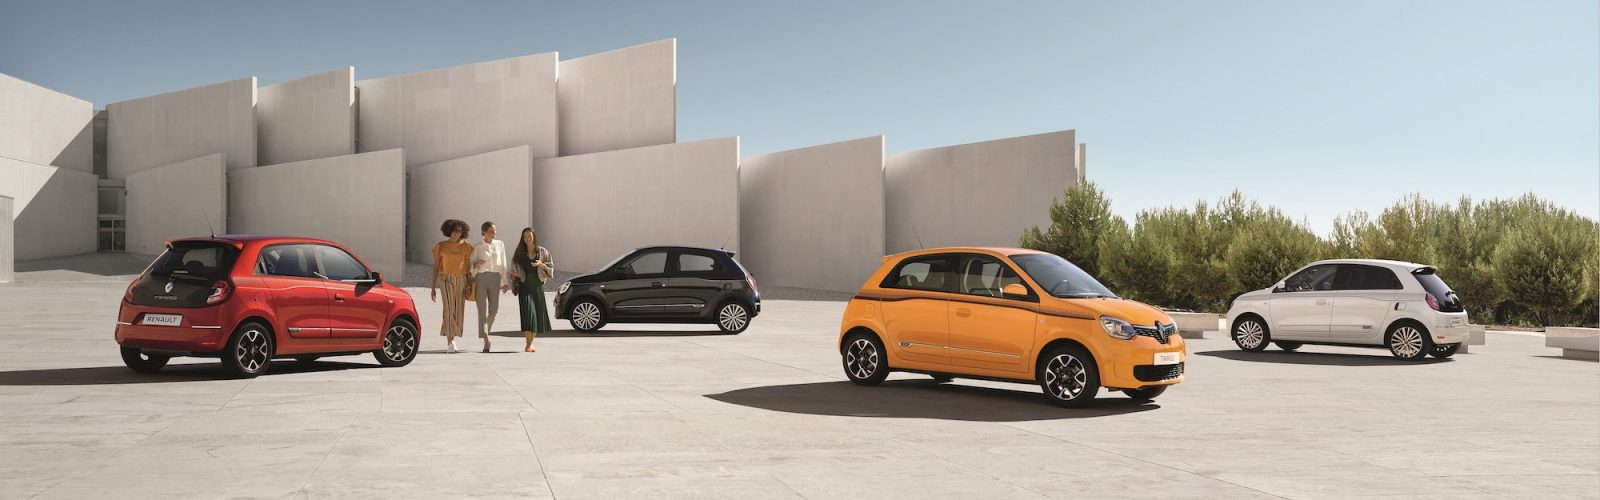 Renault Twingo restylee 42